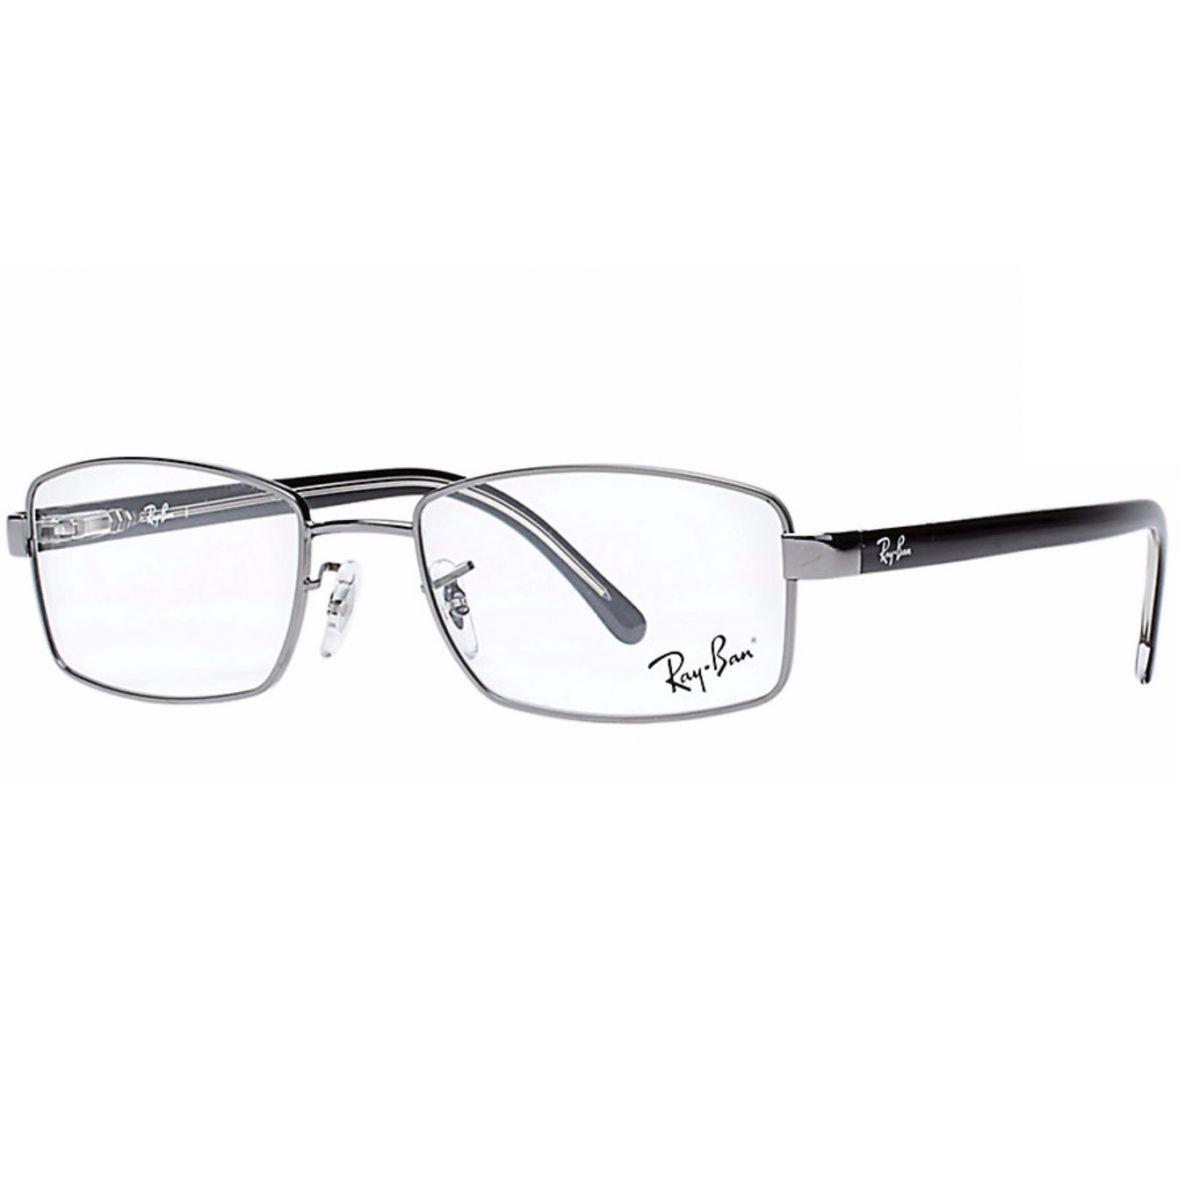 56b1c0336984b Oculos Ray Ban Grau Masculino   Louisiana Bucket Brigade